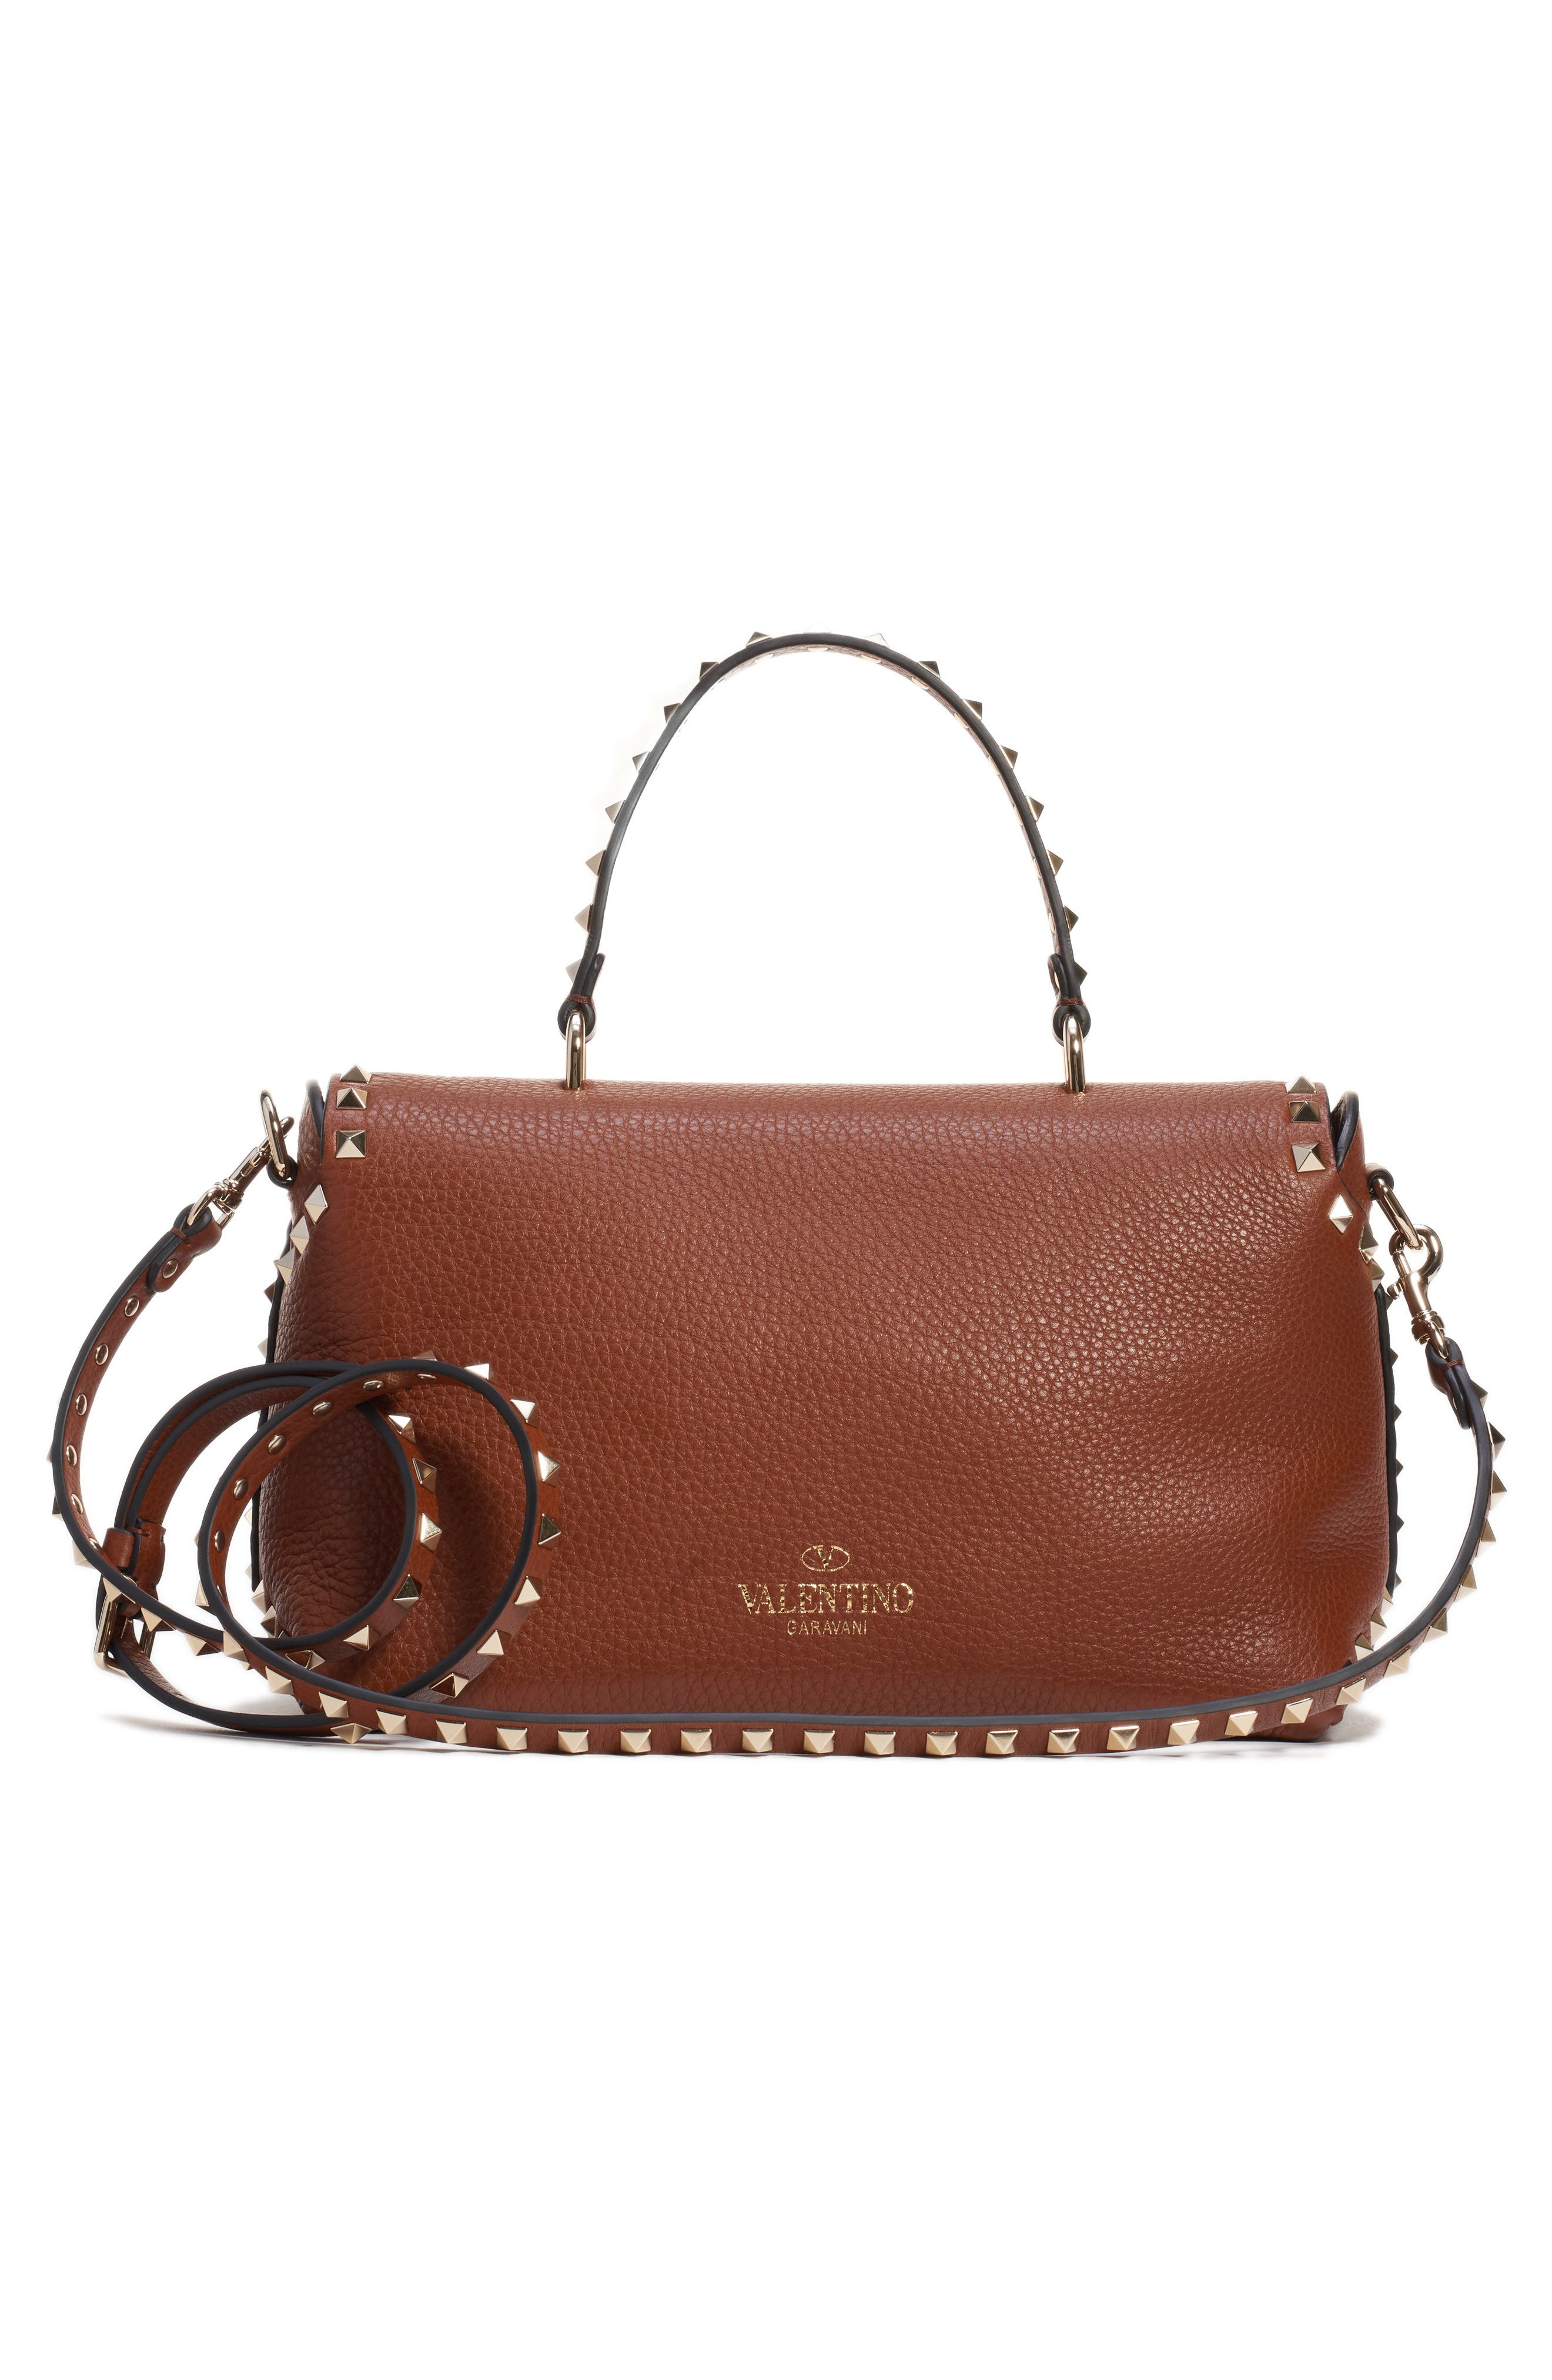 Medium Rockstud Leather Crossbody Bag,                             Alternate thumbnail 3, color,                             BRIGHT COGNAC